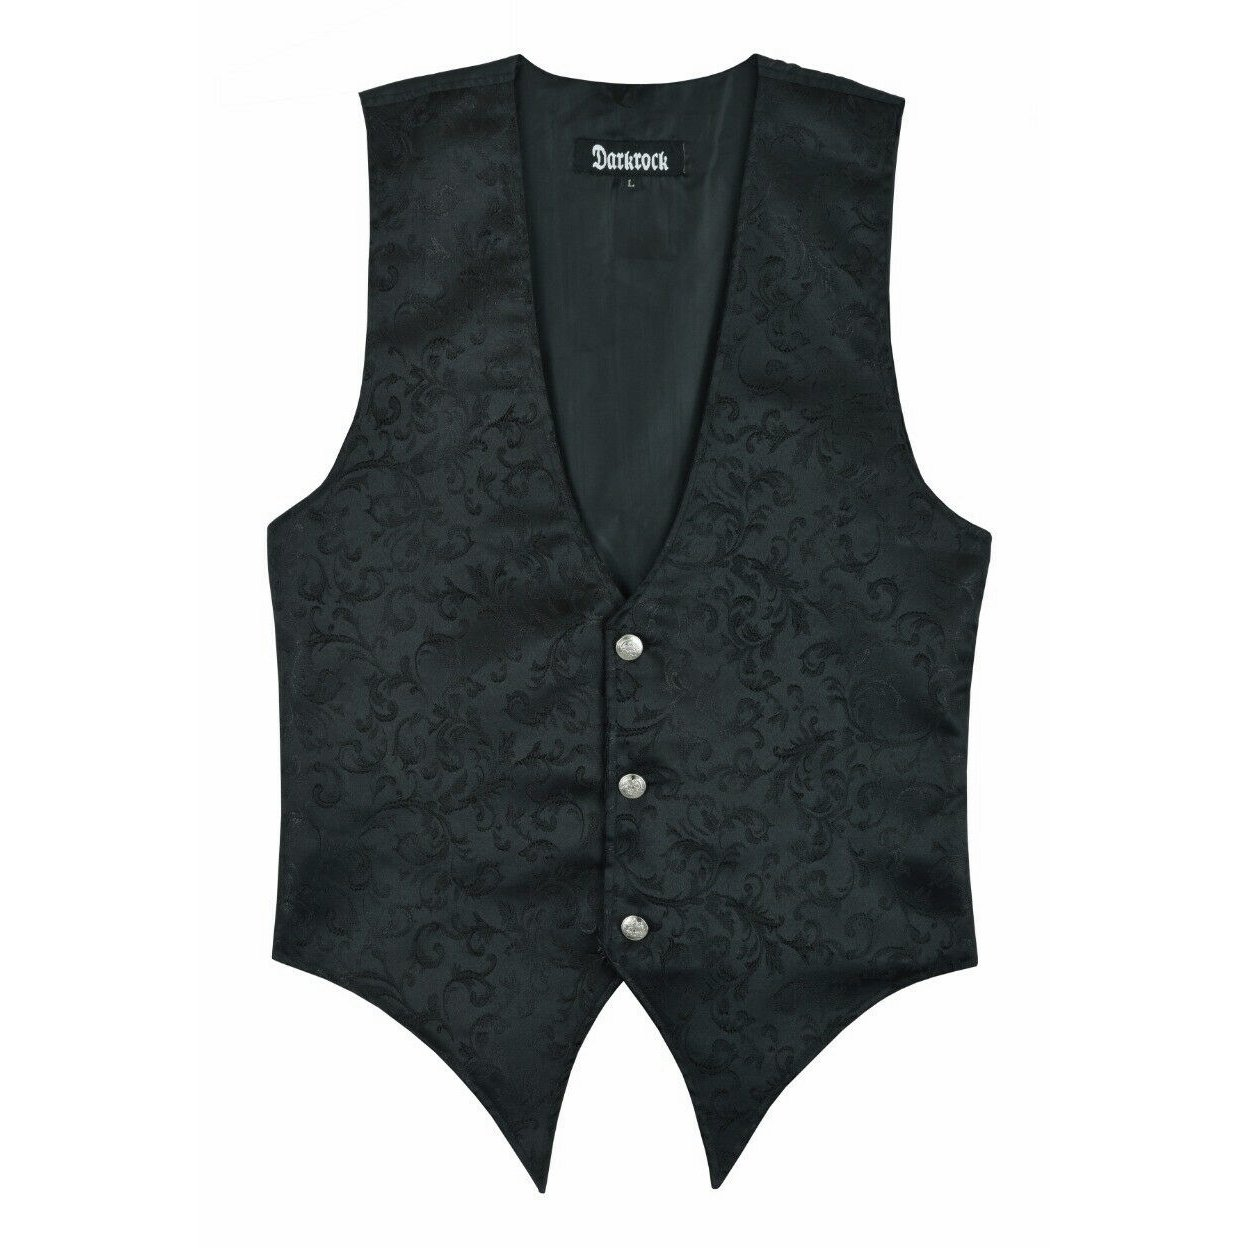 DARKROCK Victorian Single Breasted Brocade Vest Regency Waistcoat (3)